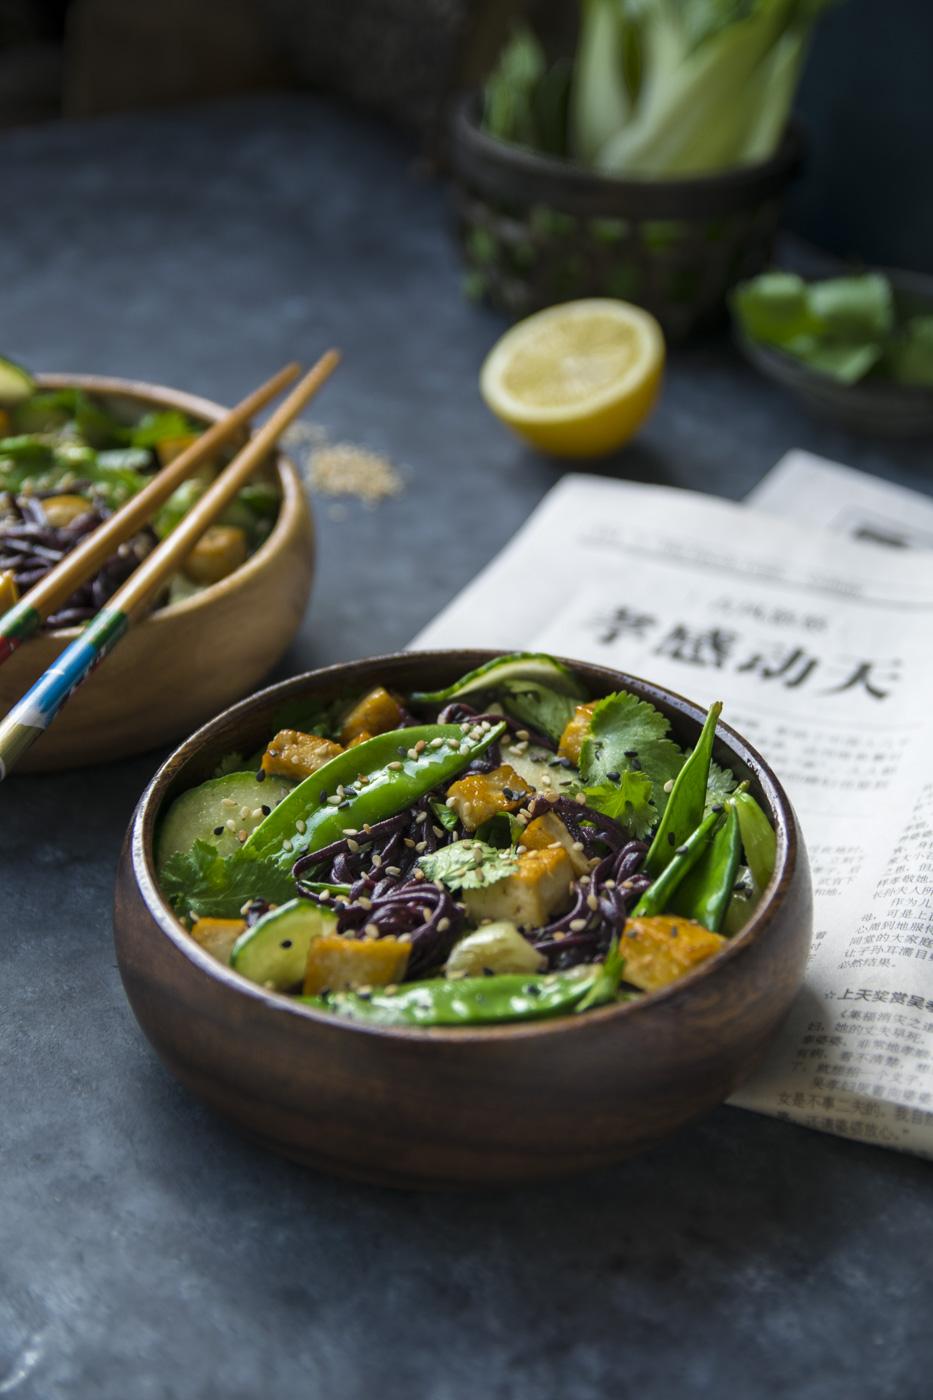 asia bowl vegan foodblog glutenfrei gesunde rezepte berlin blog 3 10 foodreich vegan foodblog. Black Bedroom Furniture Sets. Home Design Ideas